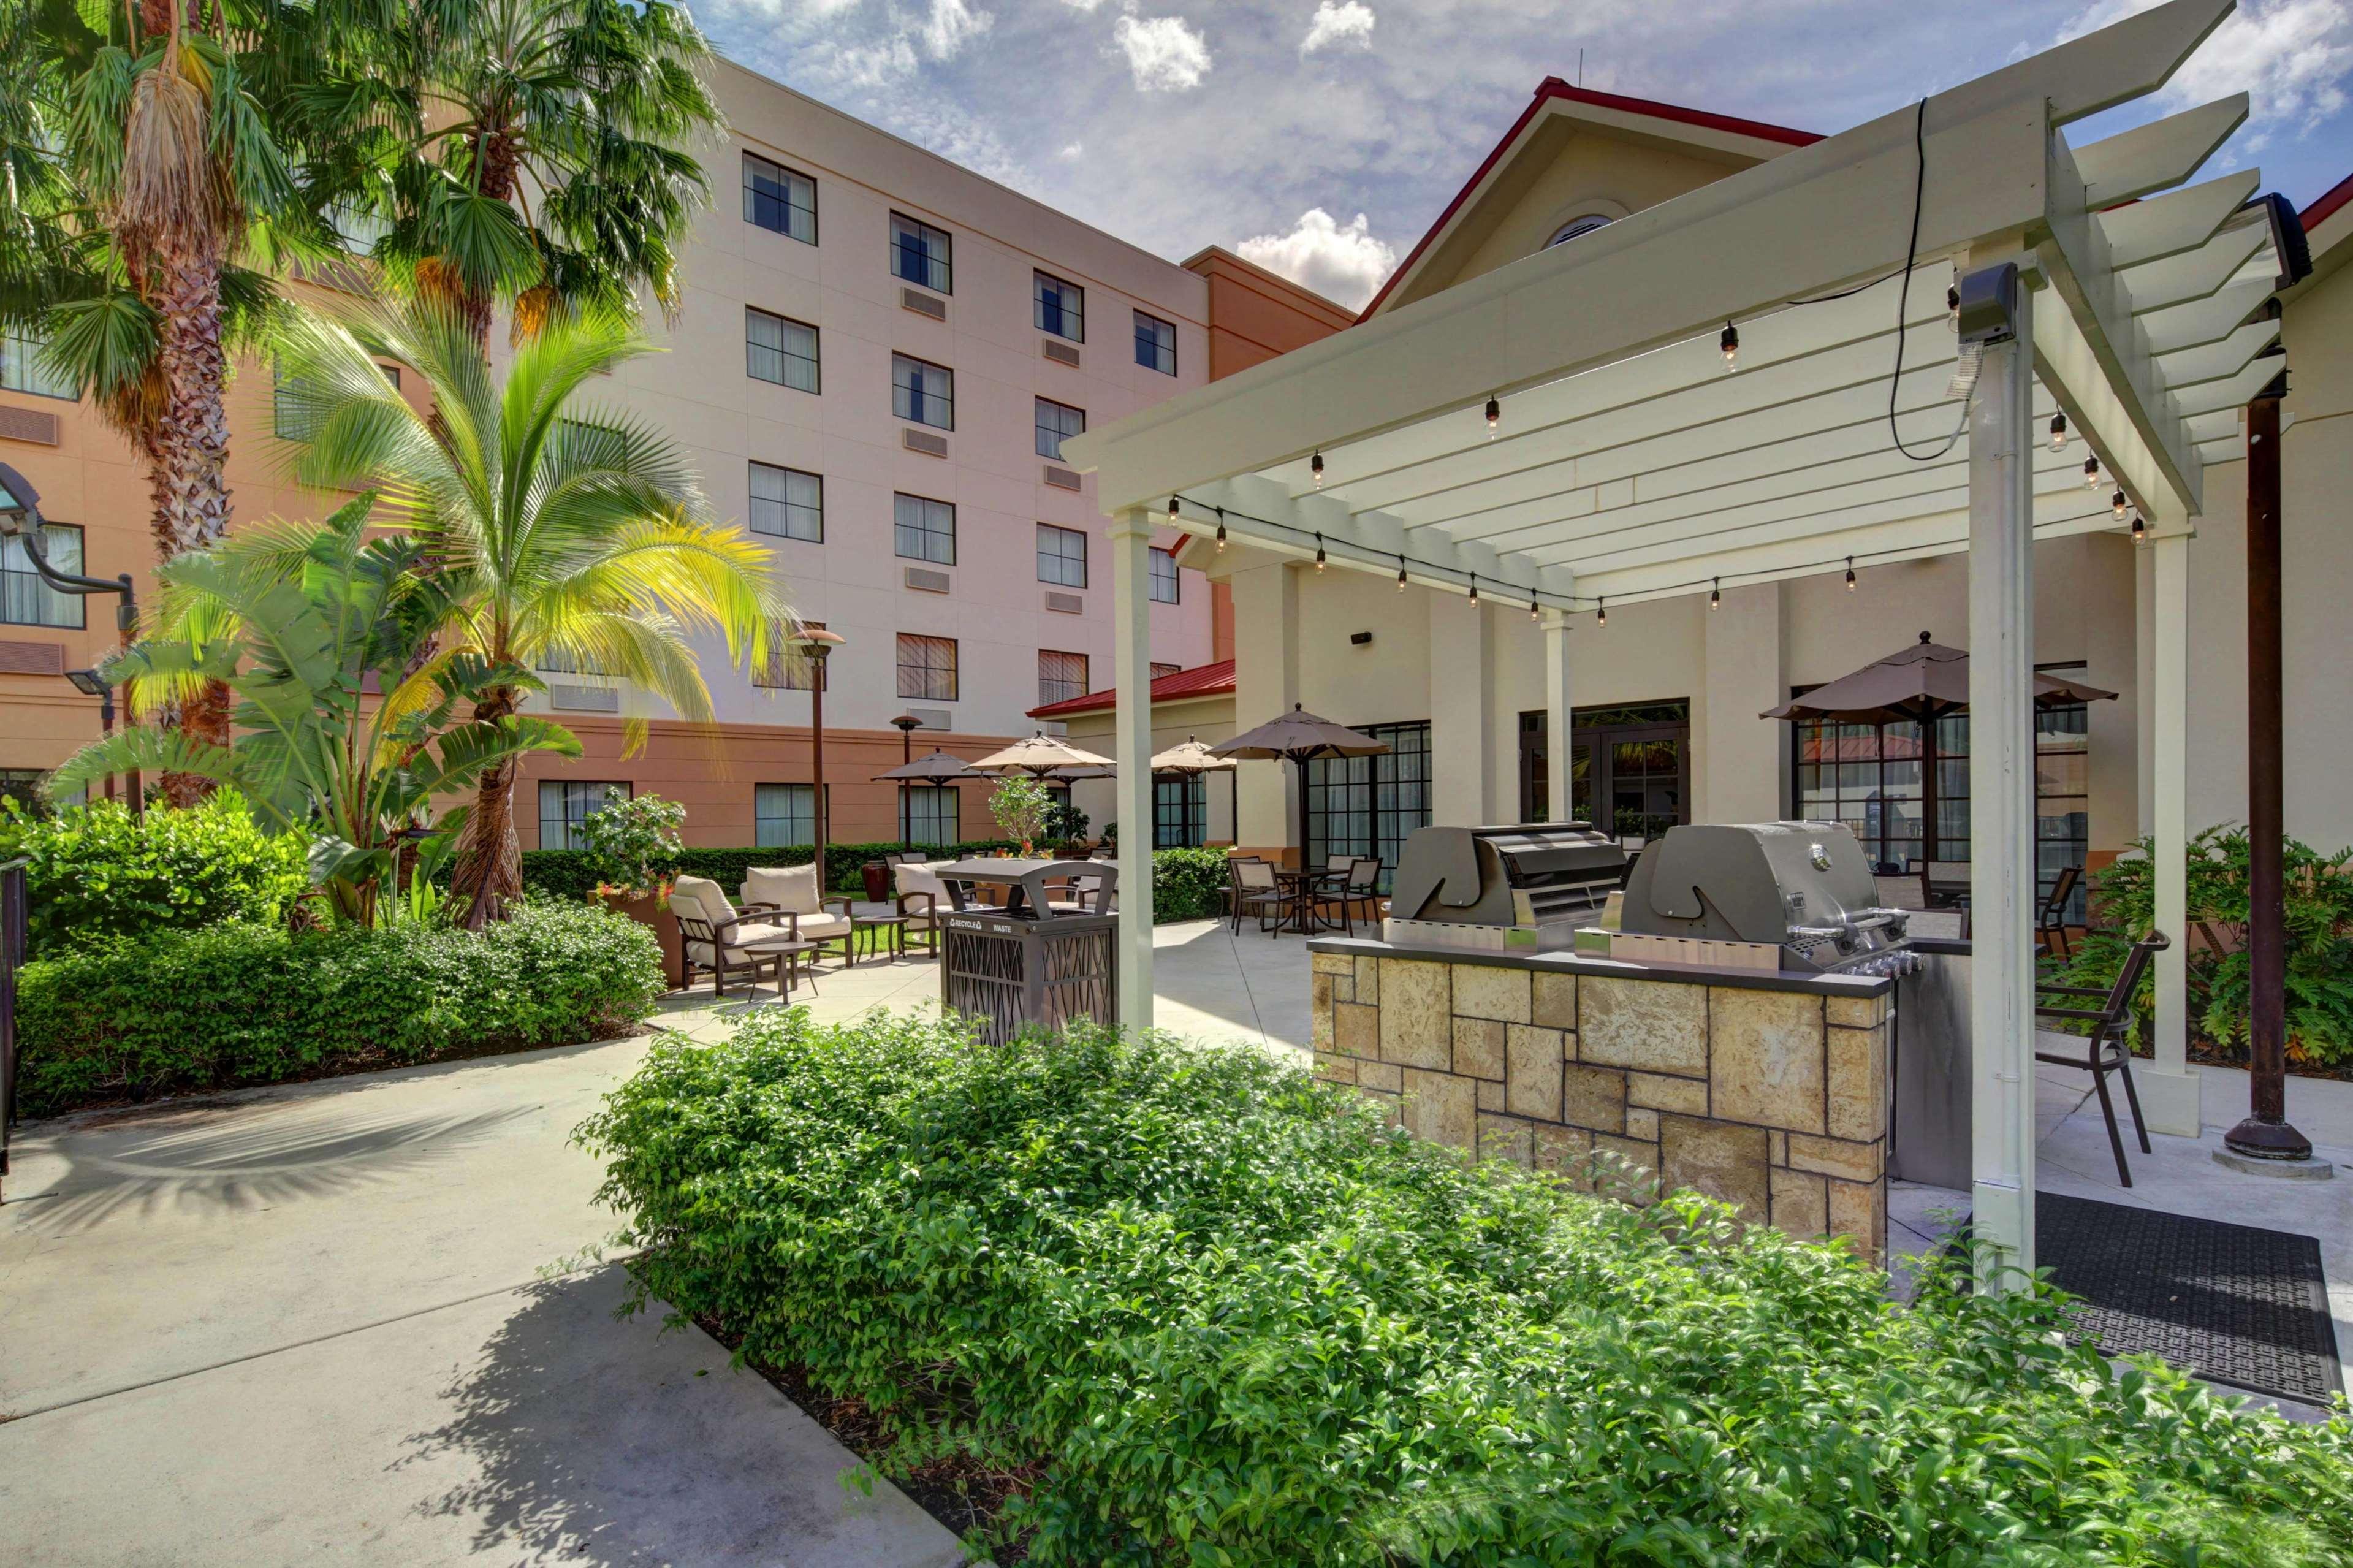 Homewood Suites by Hilton West Palm Beach 2455 Metrocentre Boulevard ...